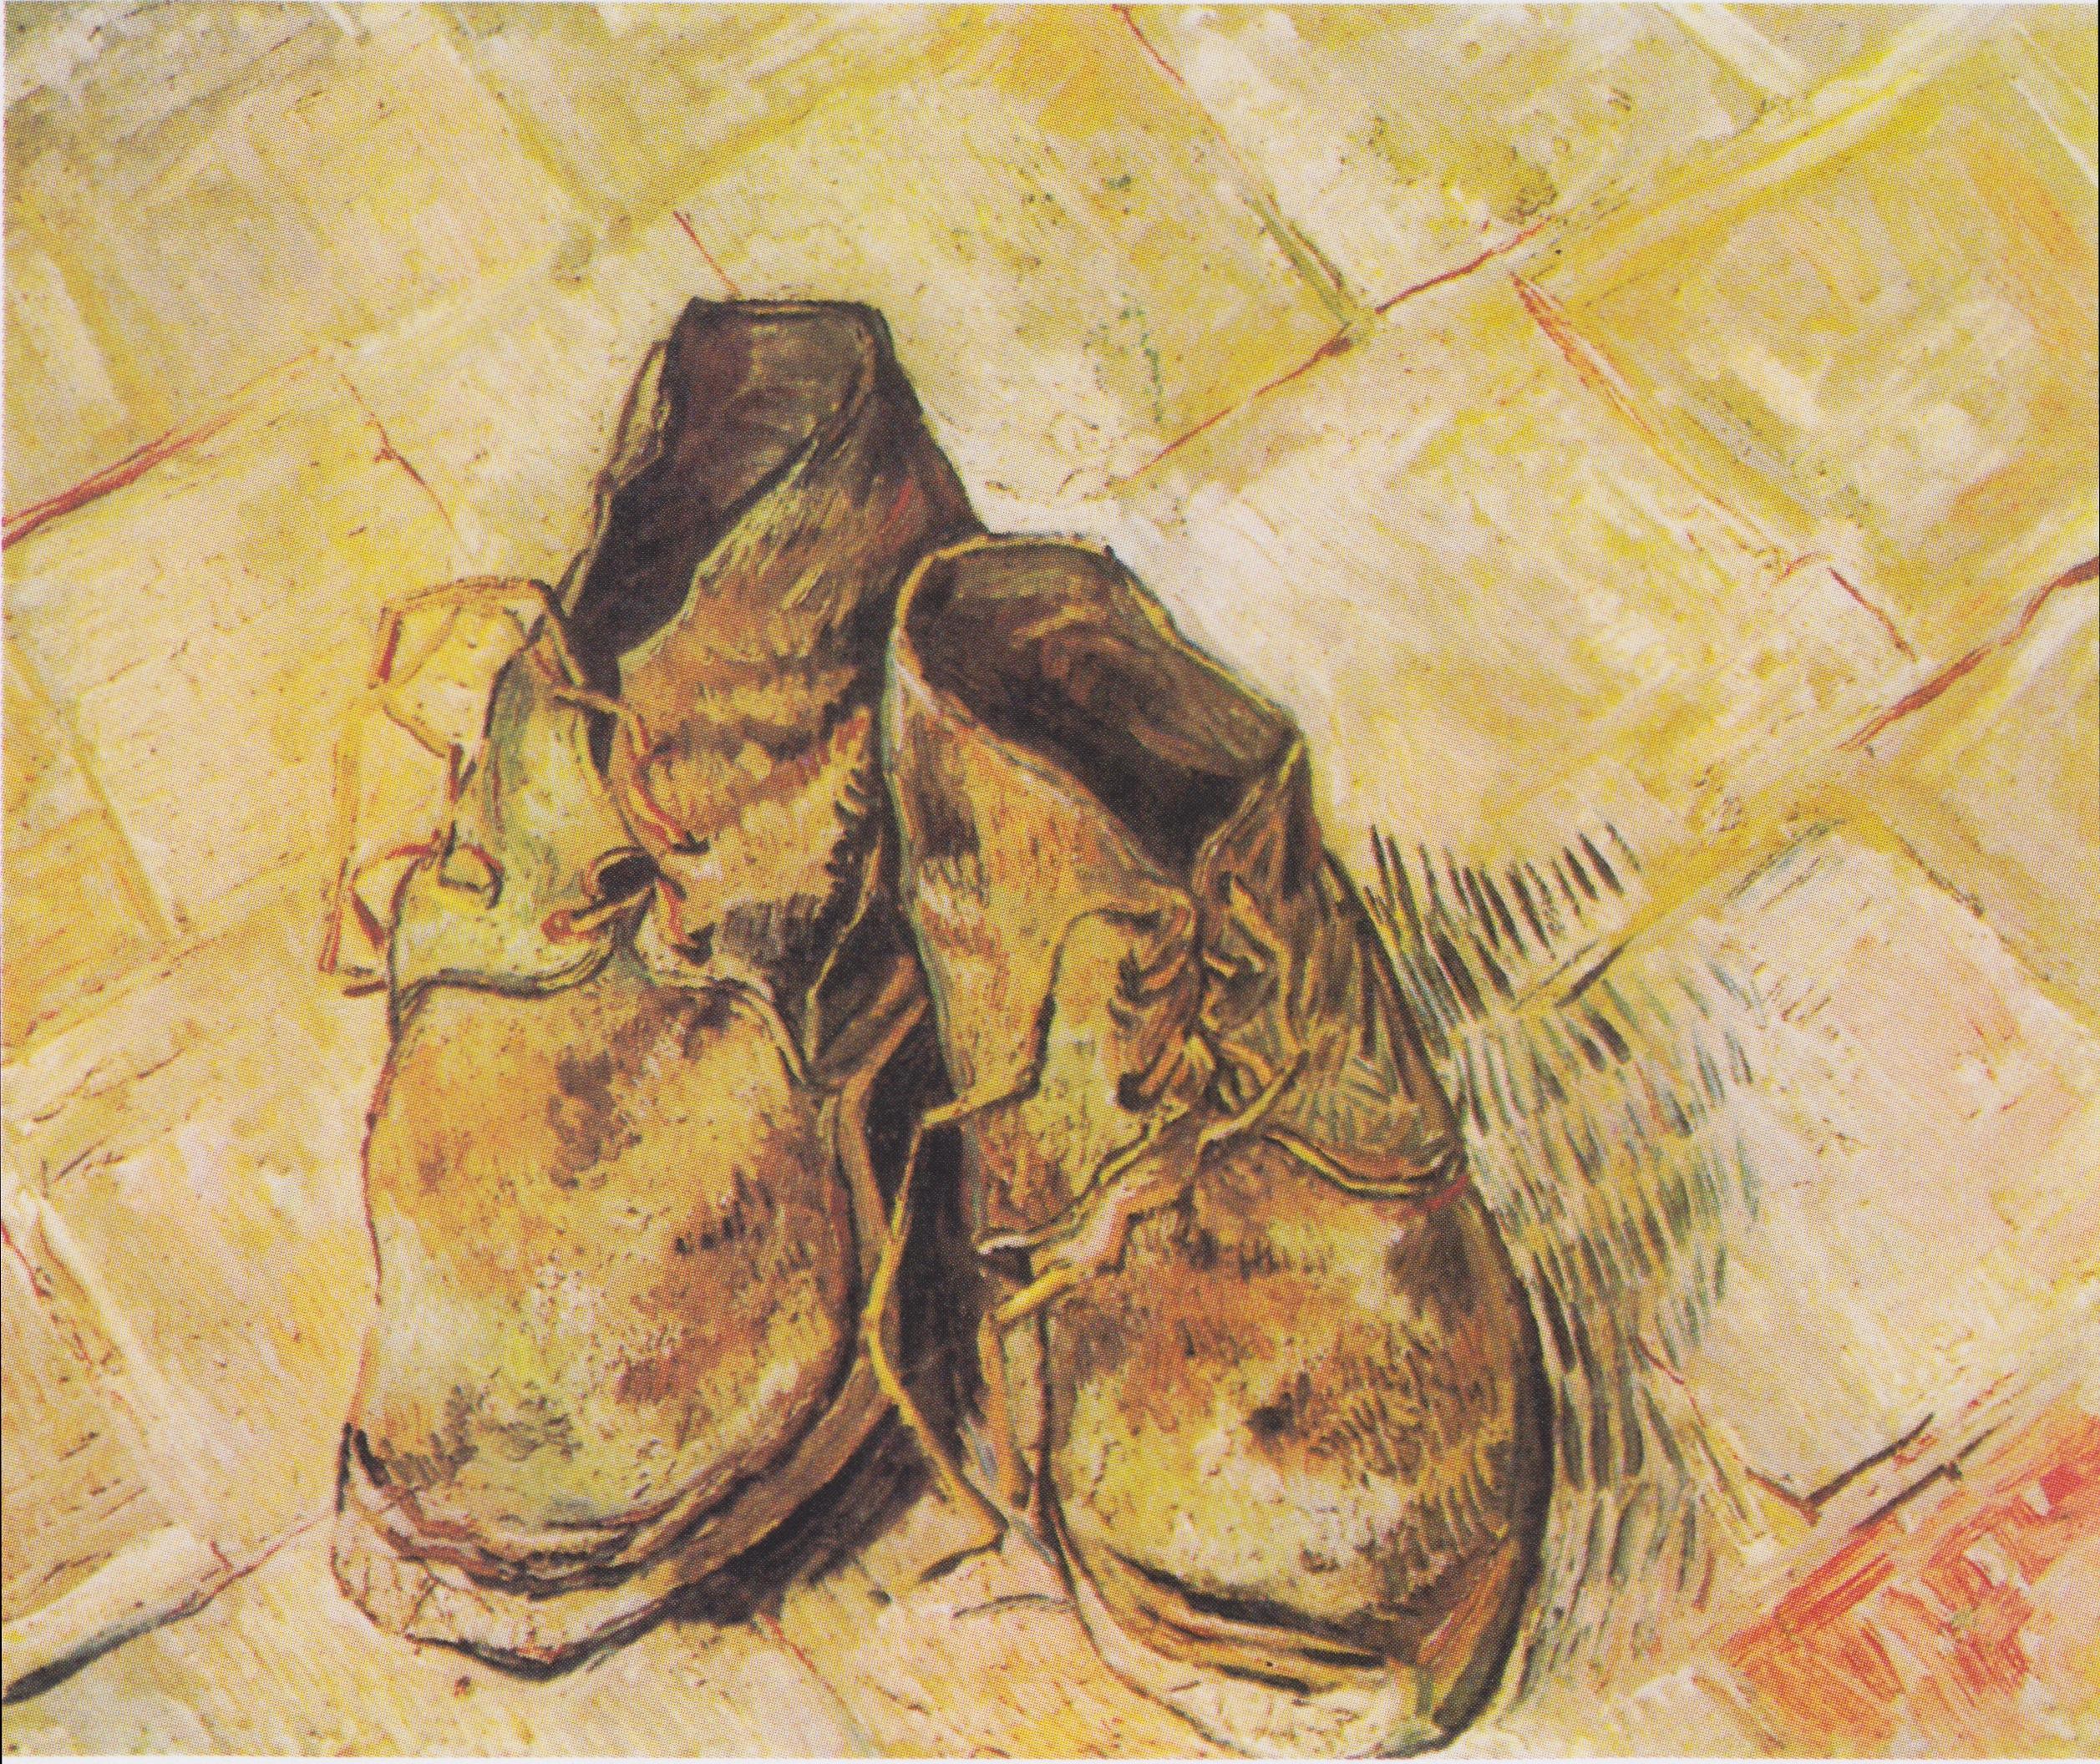 Gogh Paar Wikipedia Schuhe4 Ein van File jpeg eodCBxWr